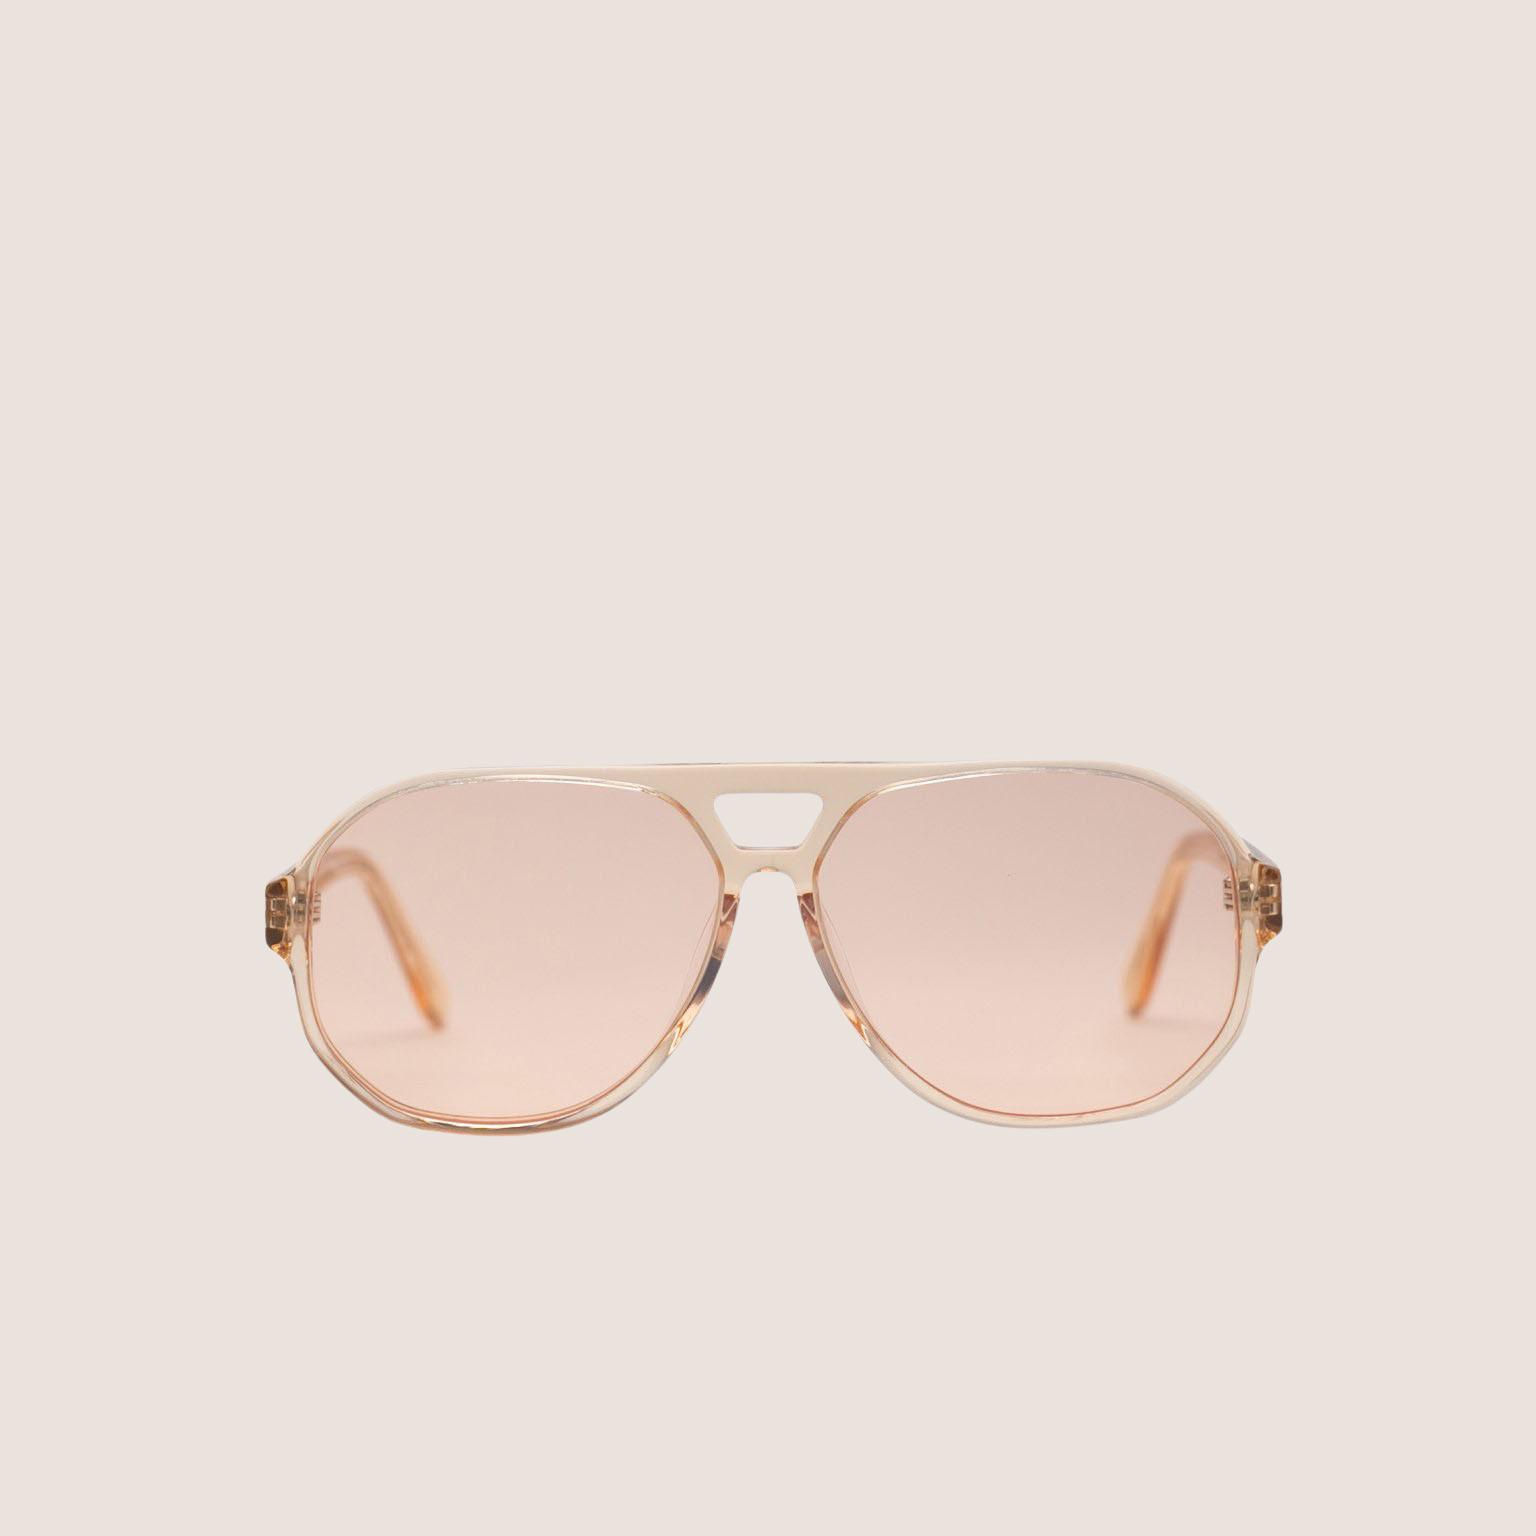 Hvass Sunglasses -Peach